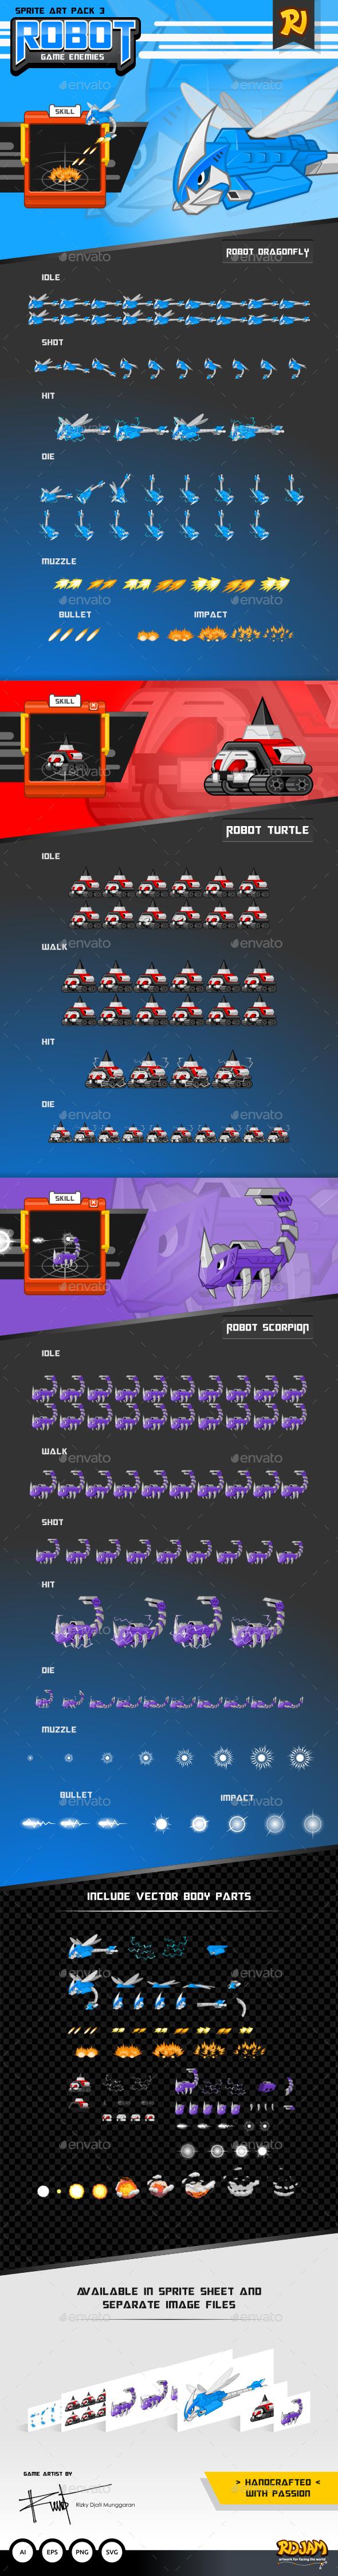 Robot Game Enemies Sprite Art Pack 3 - Sprites Game Assets